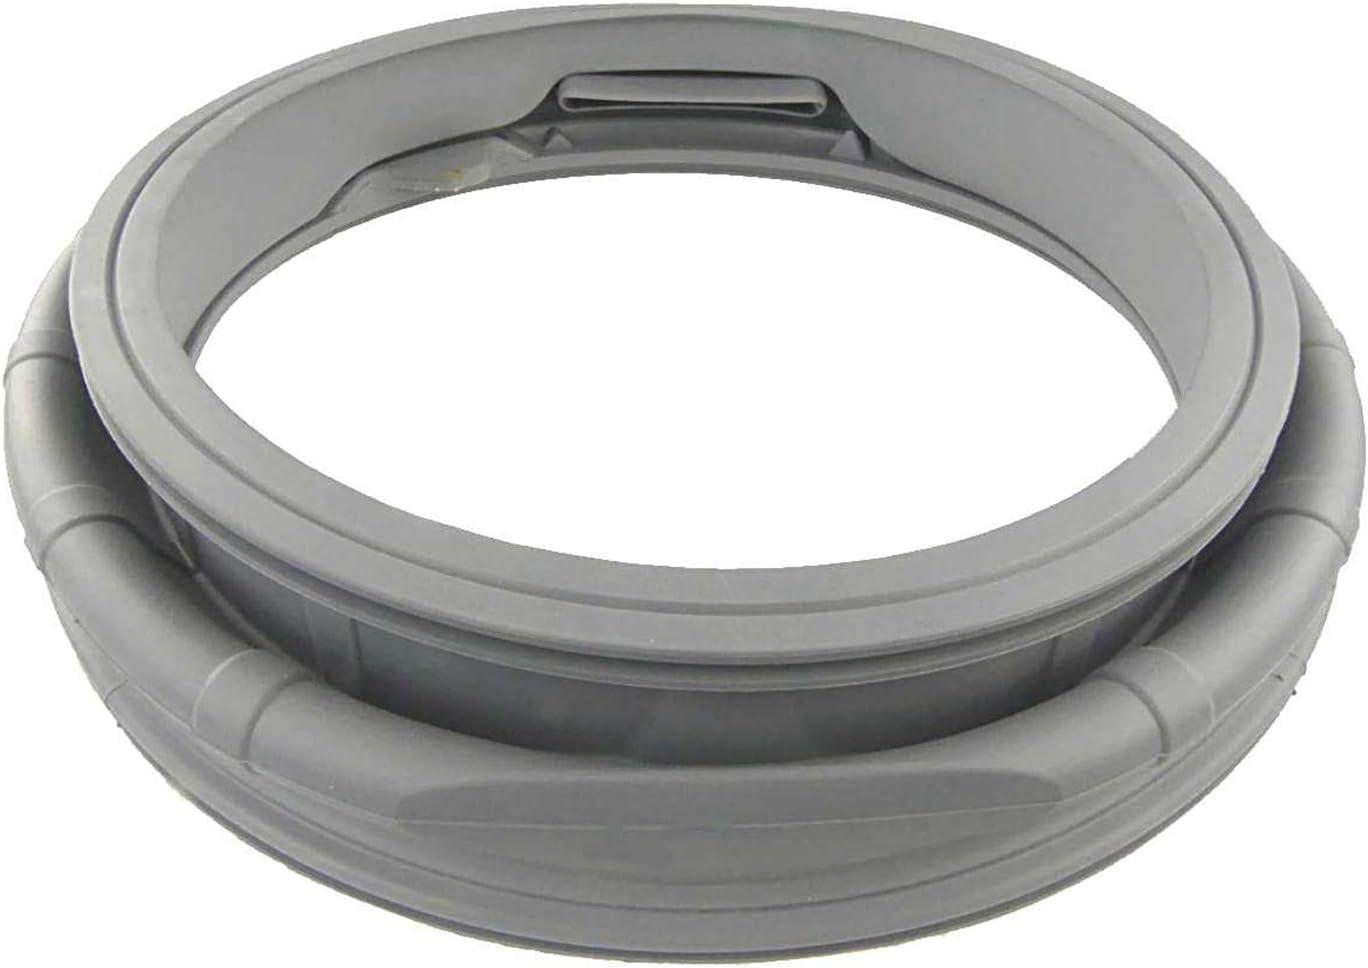 ReleMat SpareHome® Goma escotilla para lavadoras Samsung DC6401827A